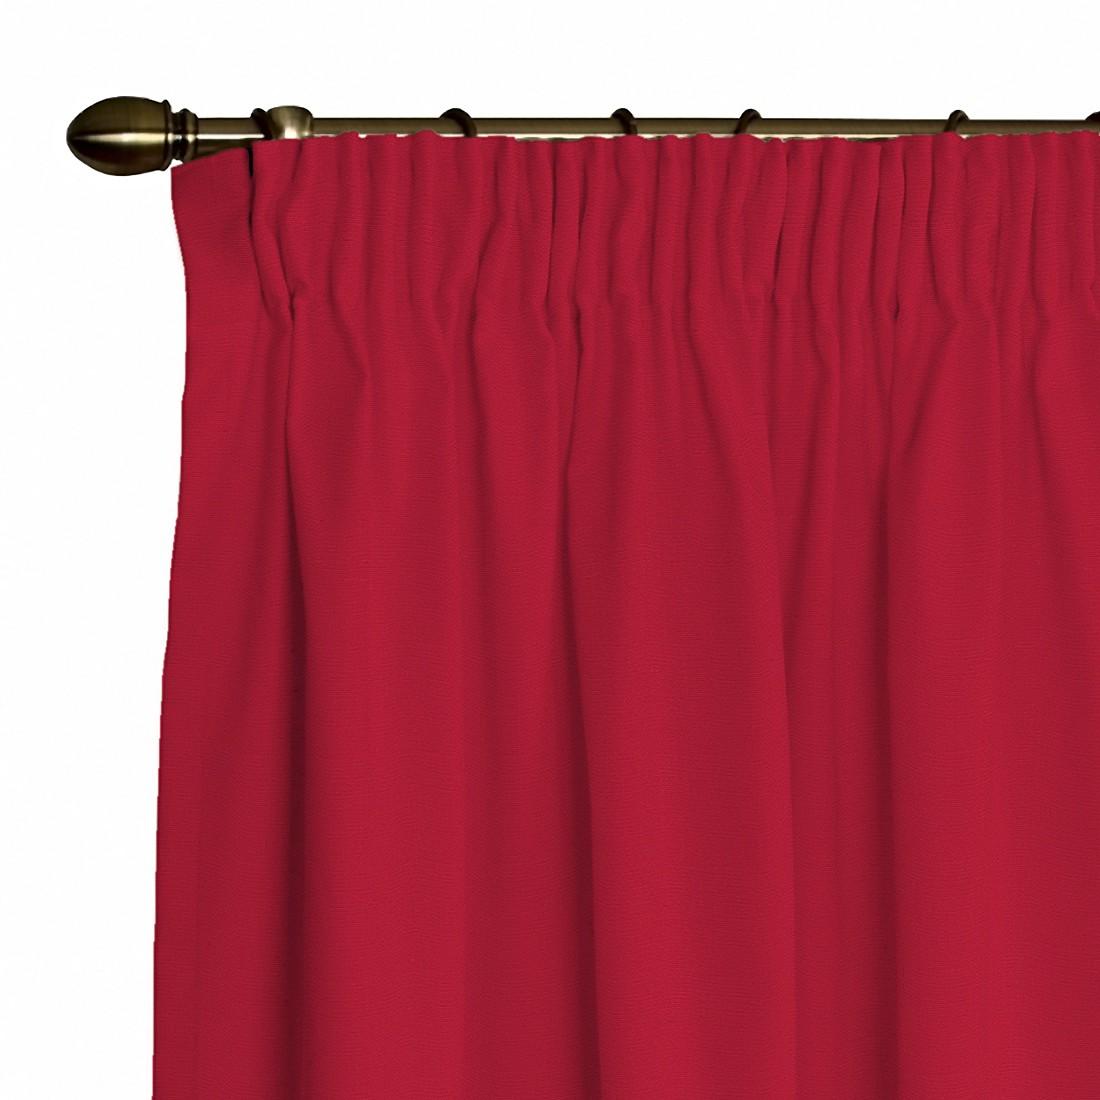 Vorhang Cotton Panama (inkl. Kräuselband) – Rubinrot – 130 x 310 cm, Dekoria bestellen